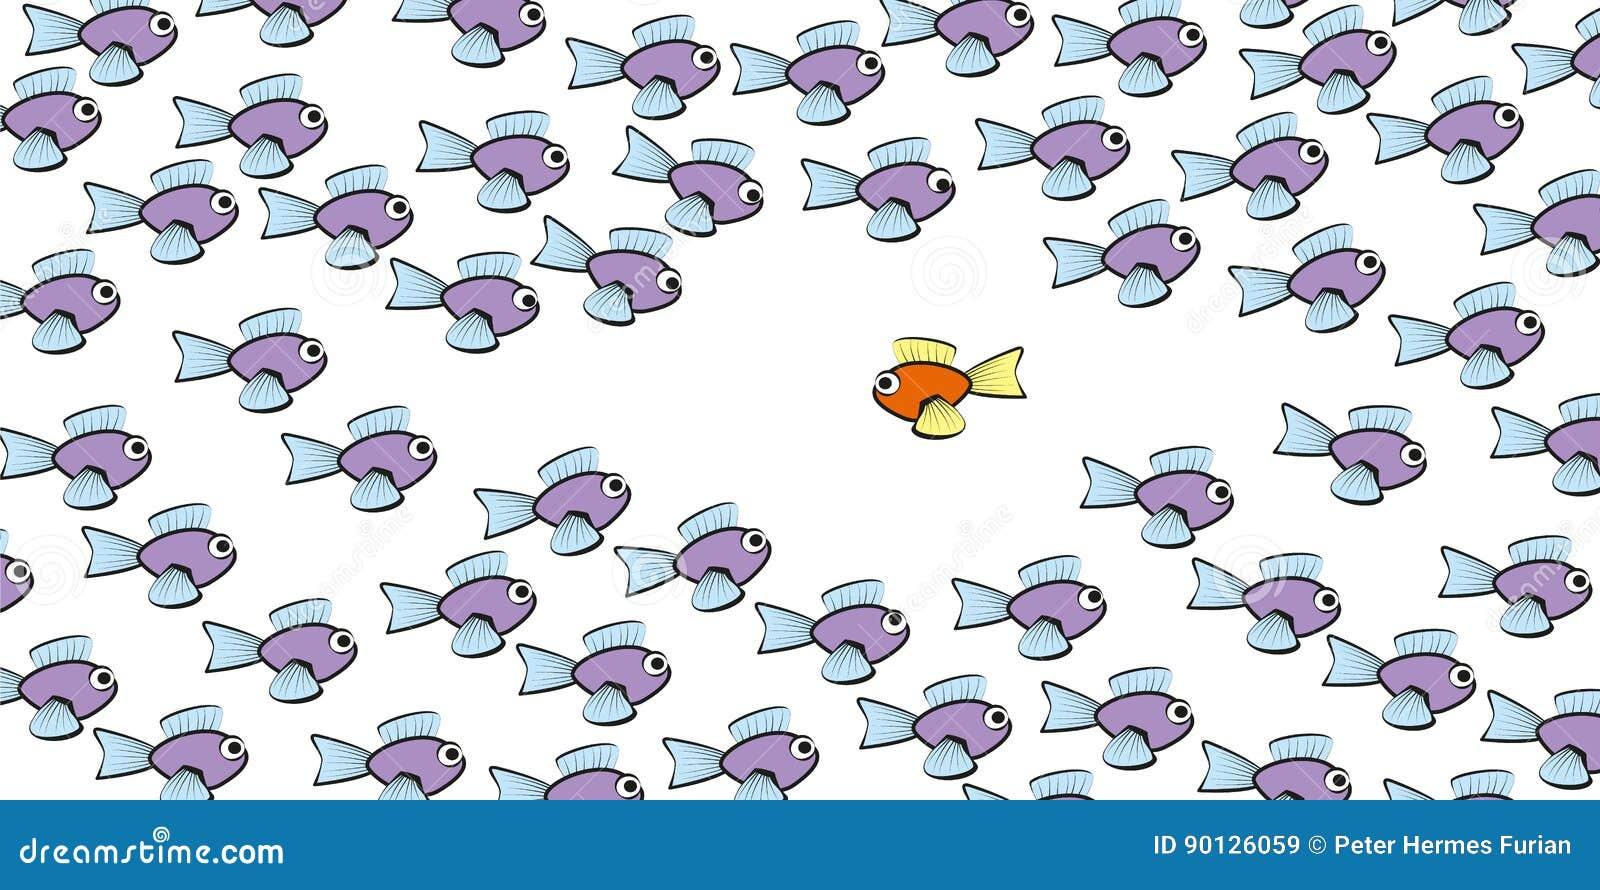 Swim against the tide fish comic stock vector illustration of swim against the tide fish comic biocorpaavc